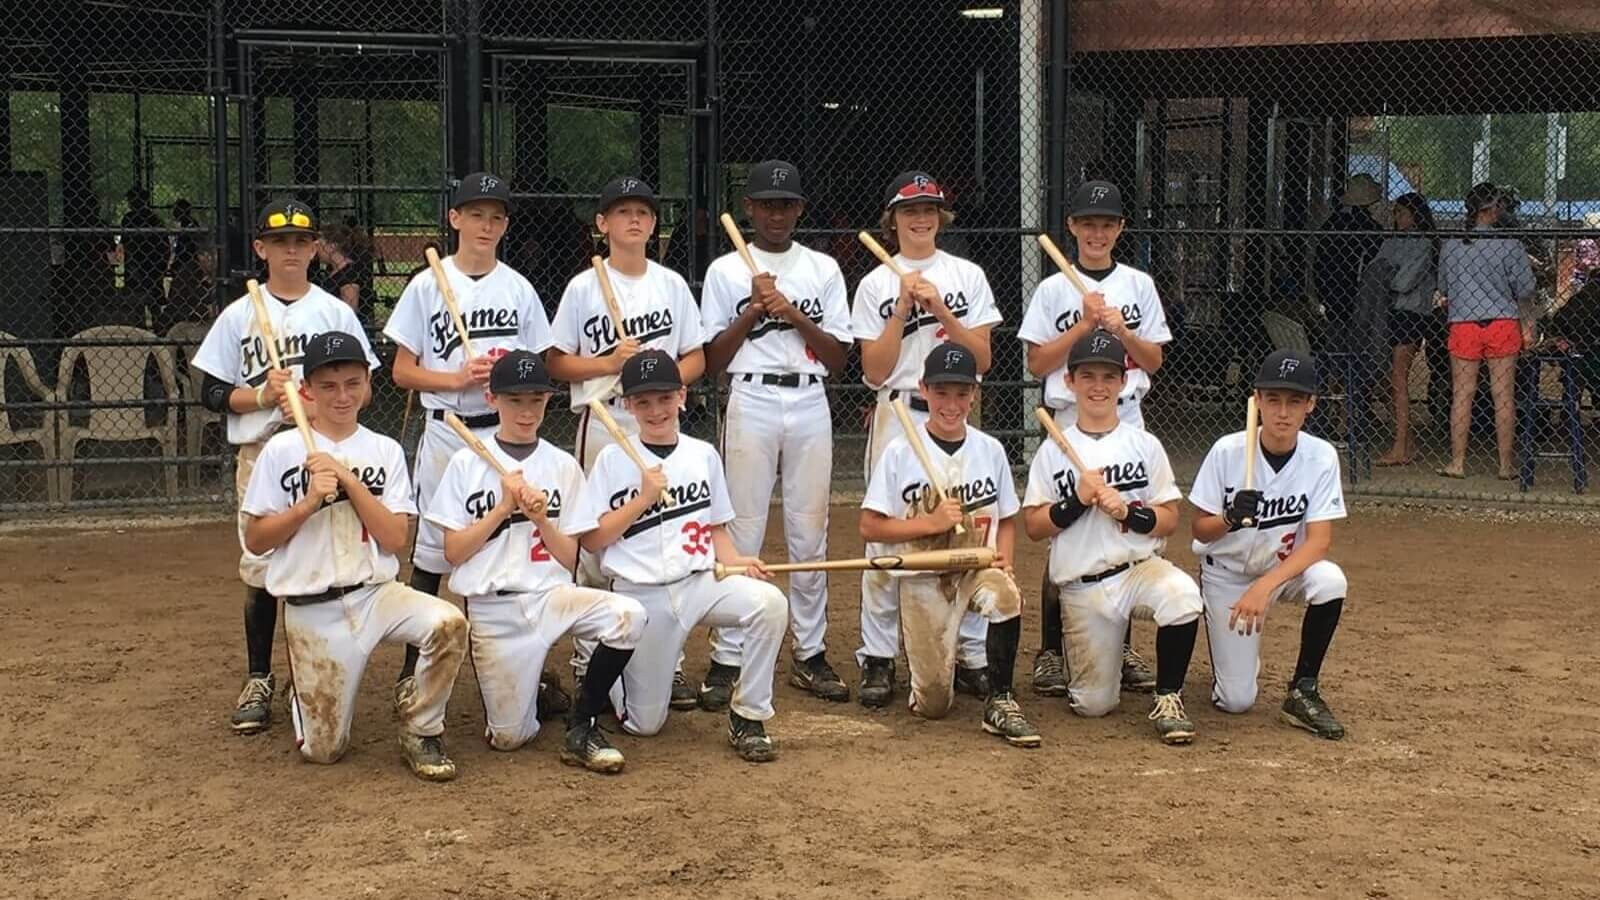 Congrats To The 12u Flames Perfect Game Cincy Flames Baseball Facebook